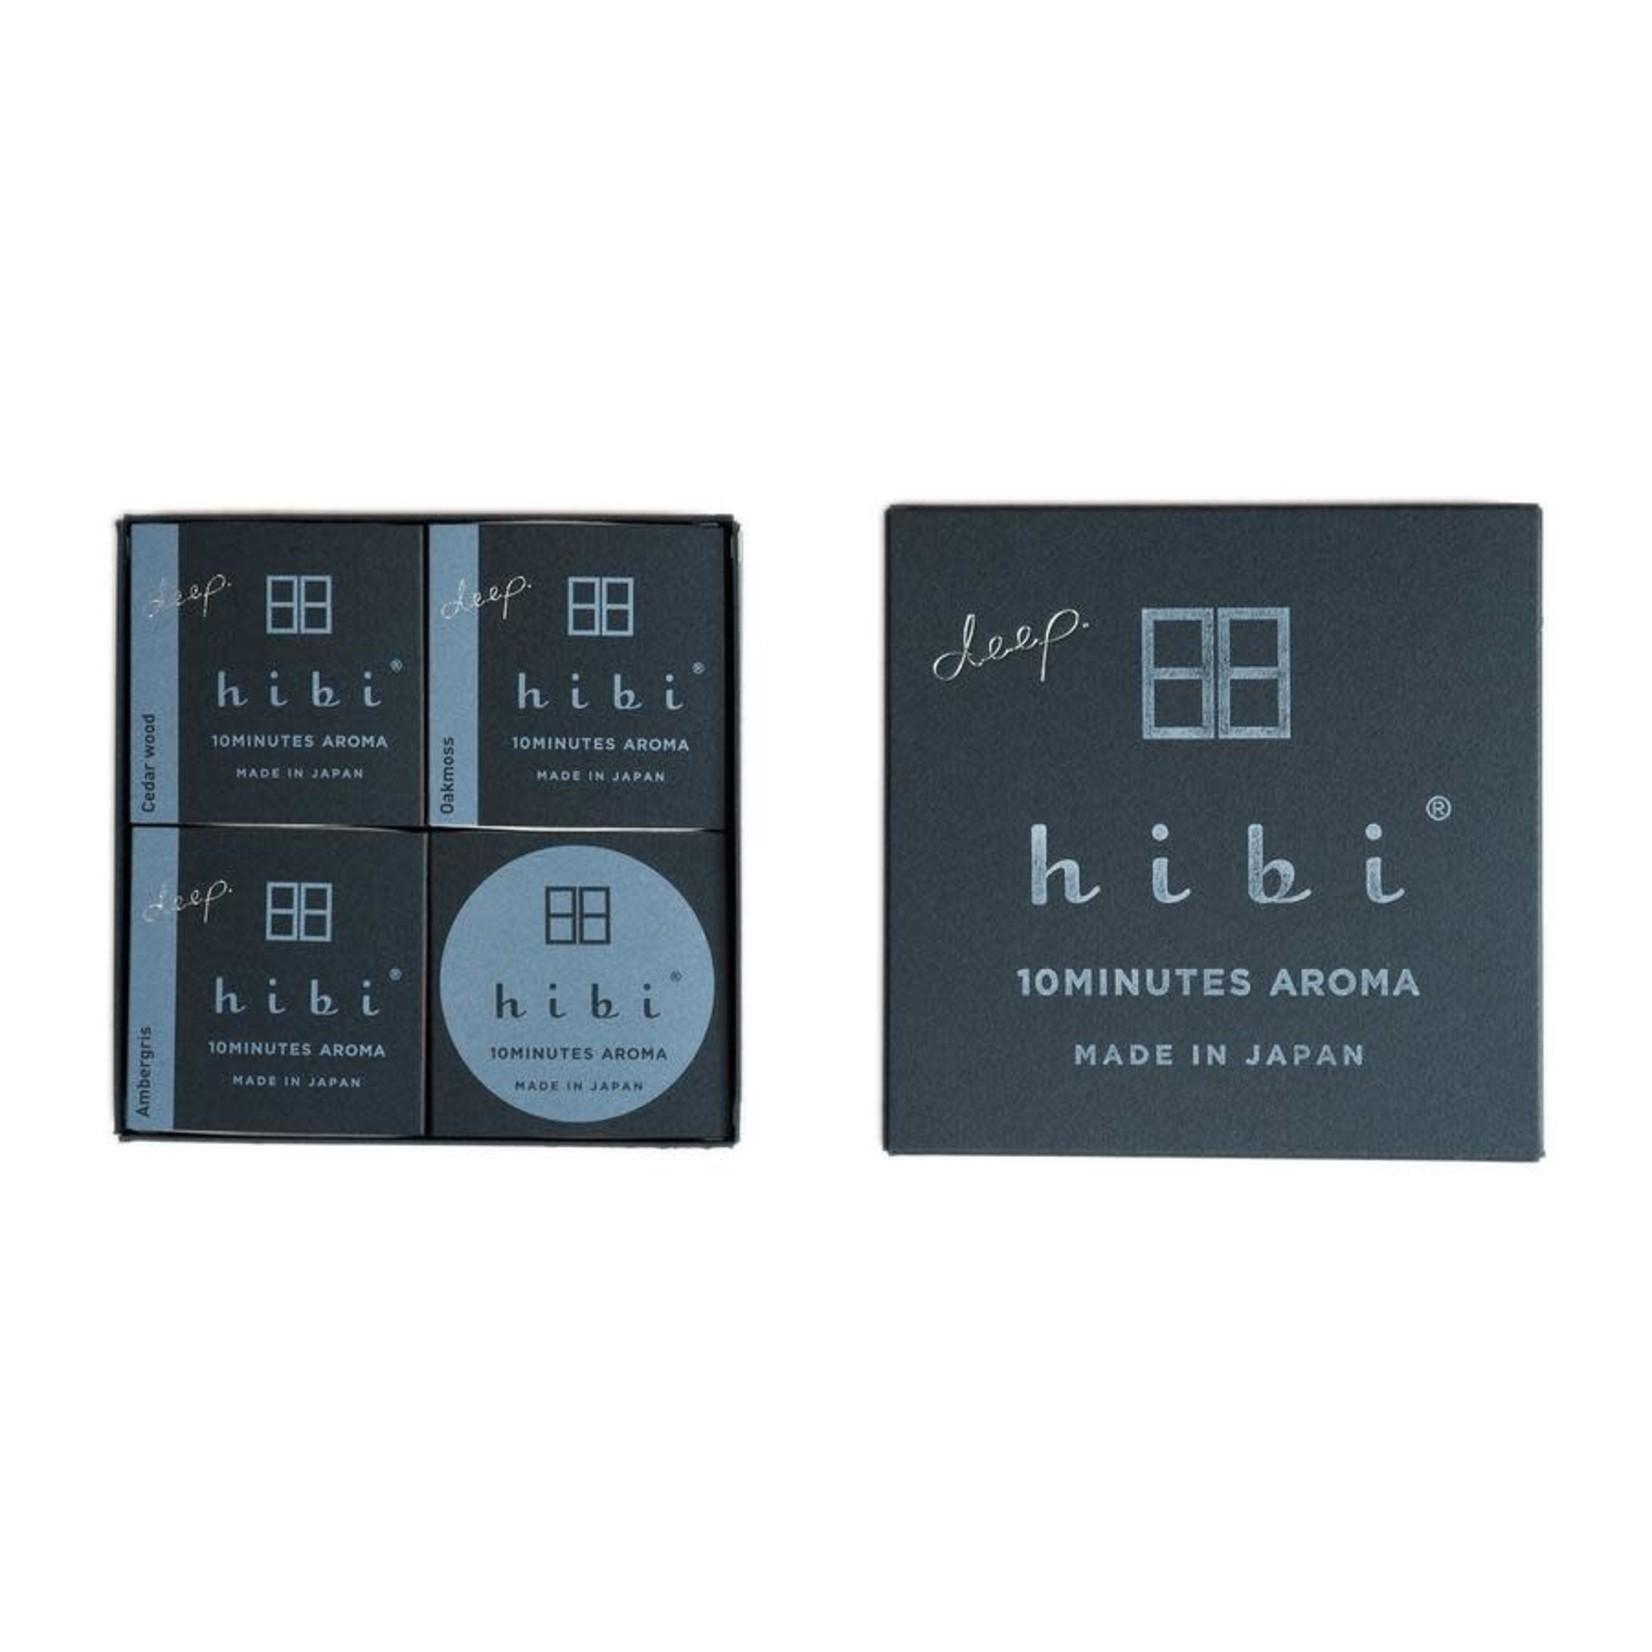 Hibi Hibi Gift Box 3 Assorted Deep Fragrances Cedar Wood, Ambergris, & Oakmoss